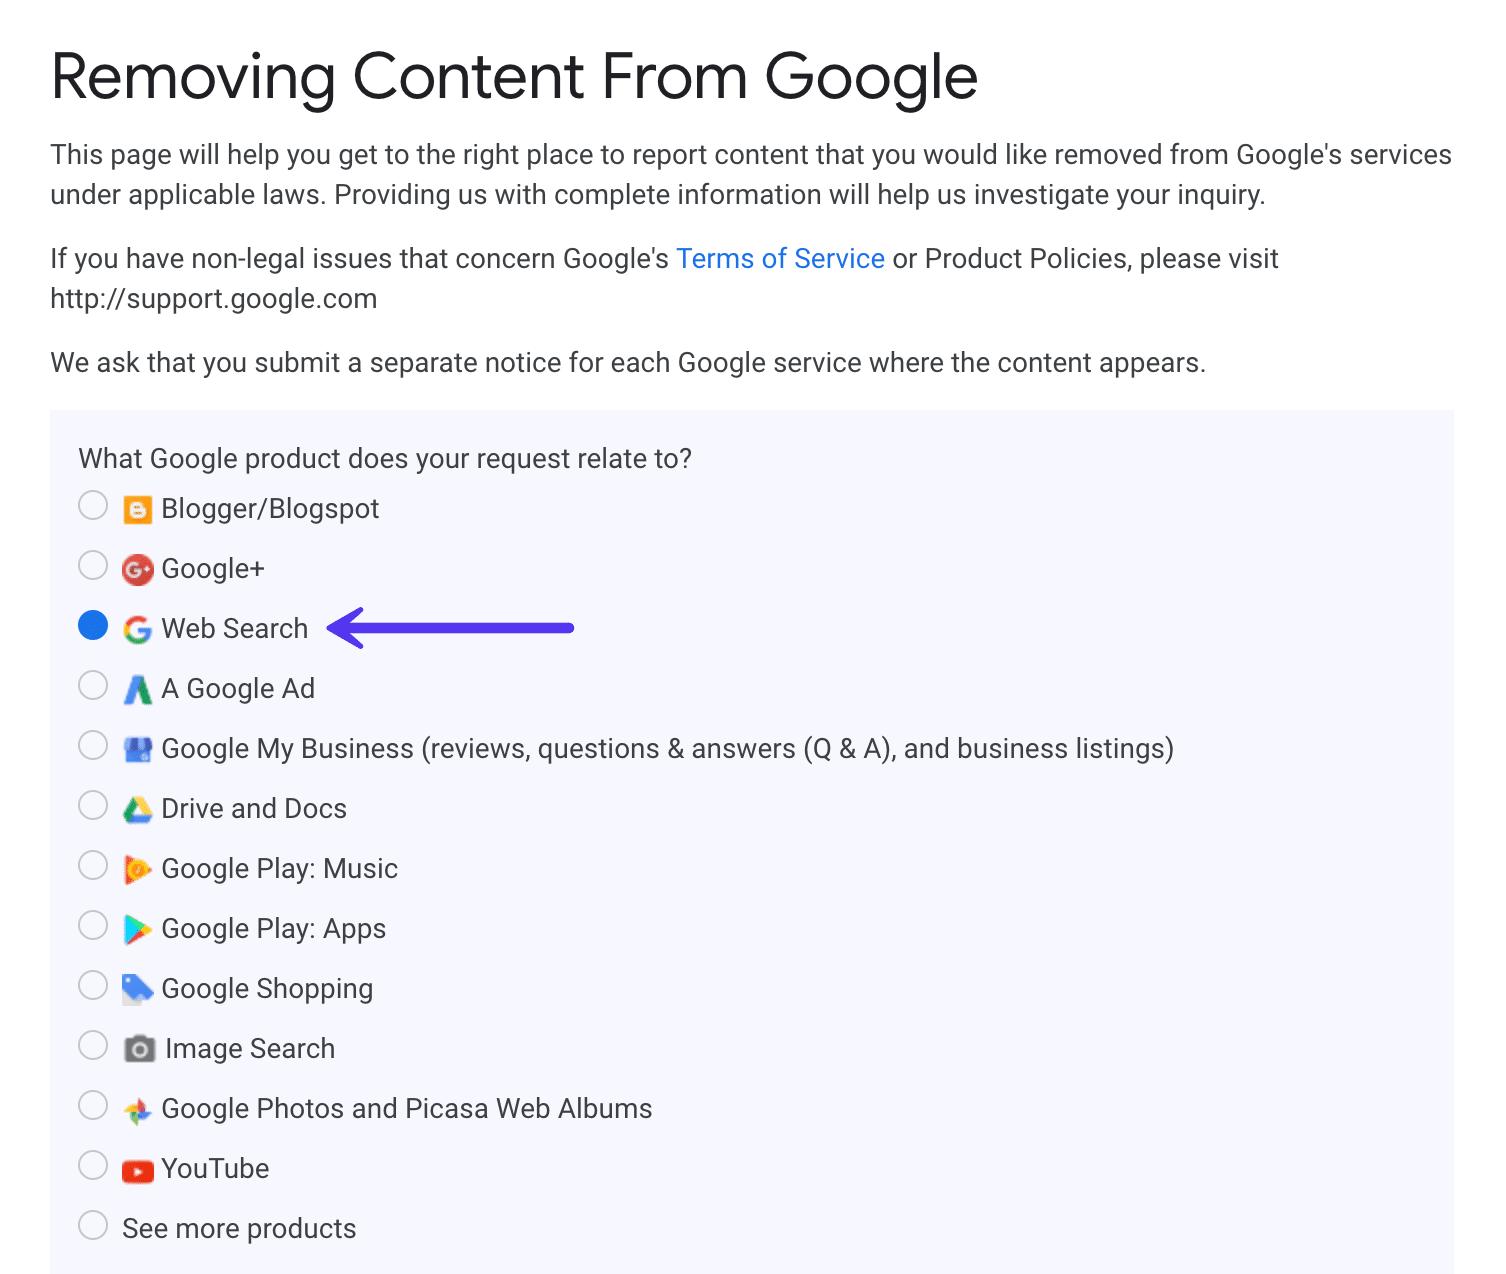 Supprimer du contenu de la recherche Google